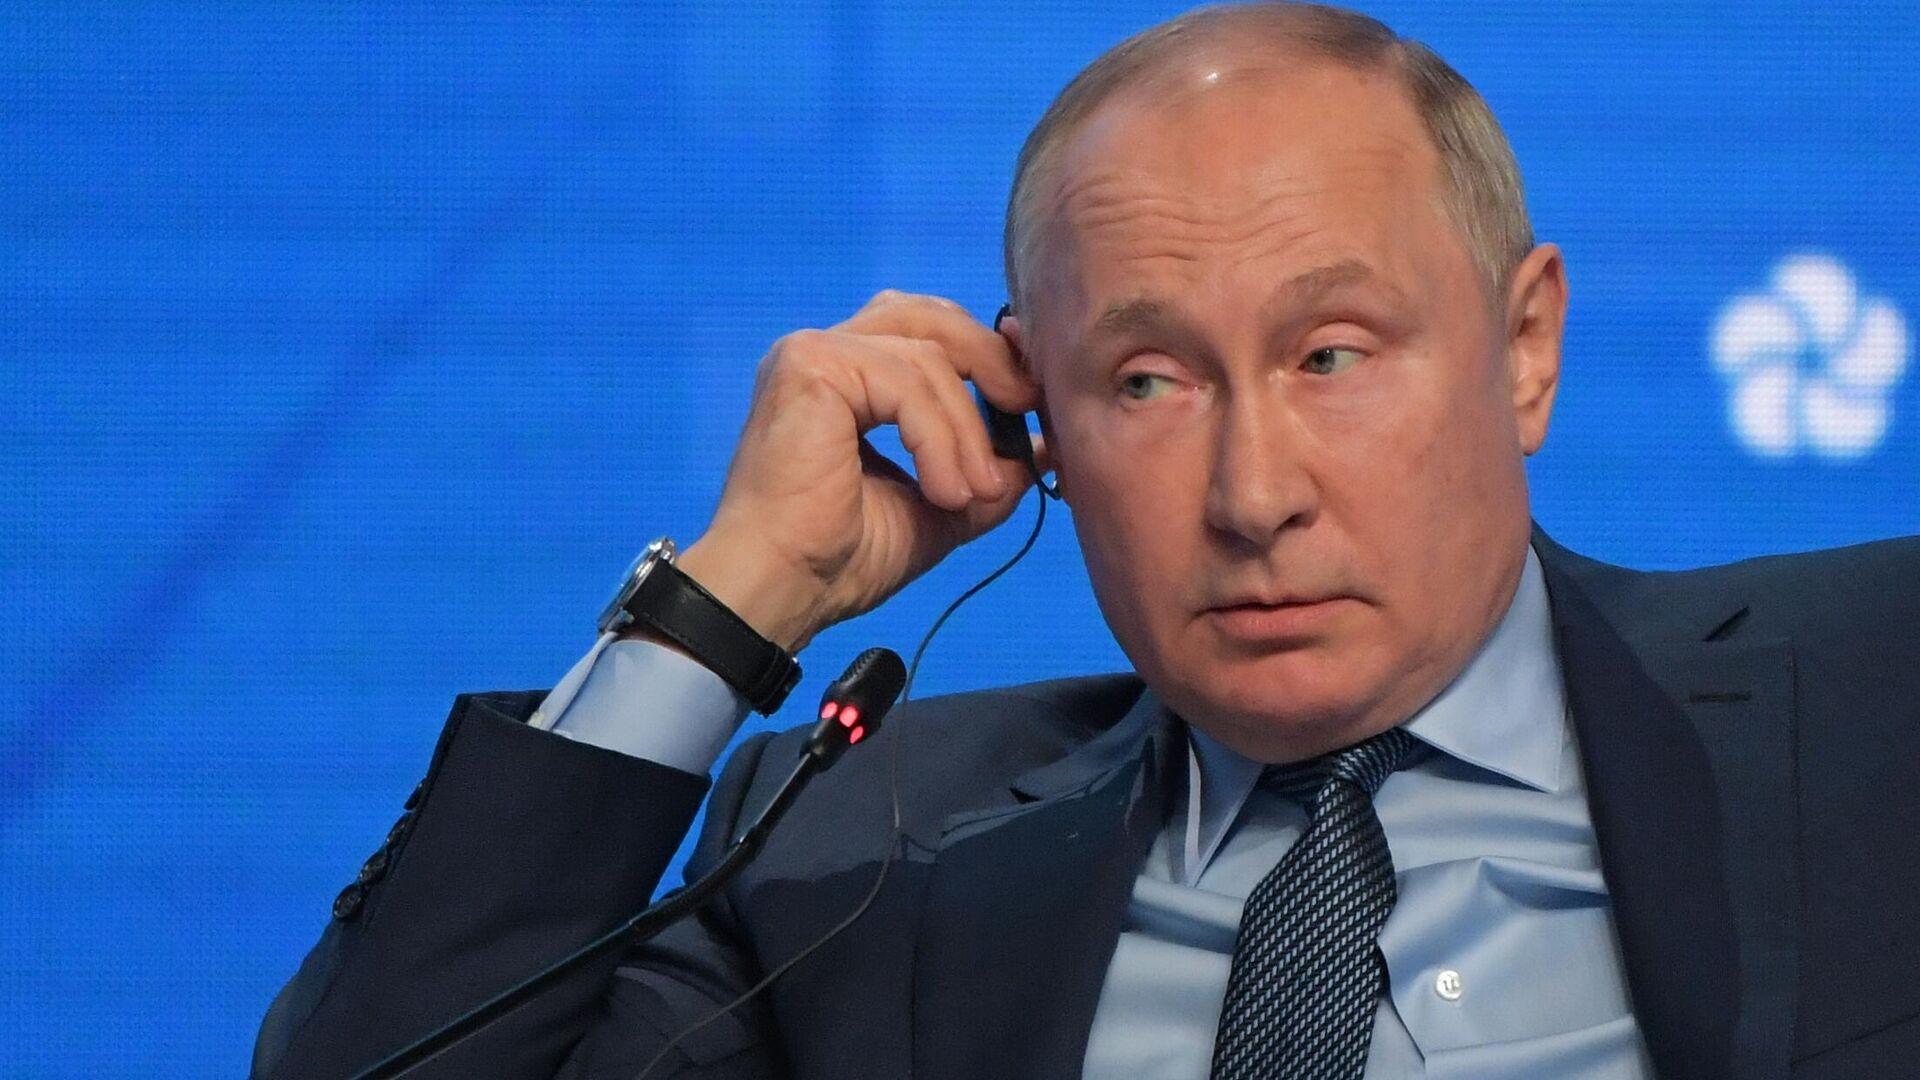 President Vladimir Putin speaking at the Russian Energy Week Forum in Moscow, 13 October 2021. - Sputnik International, 1920, 13.10.2021